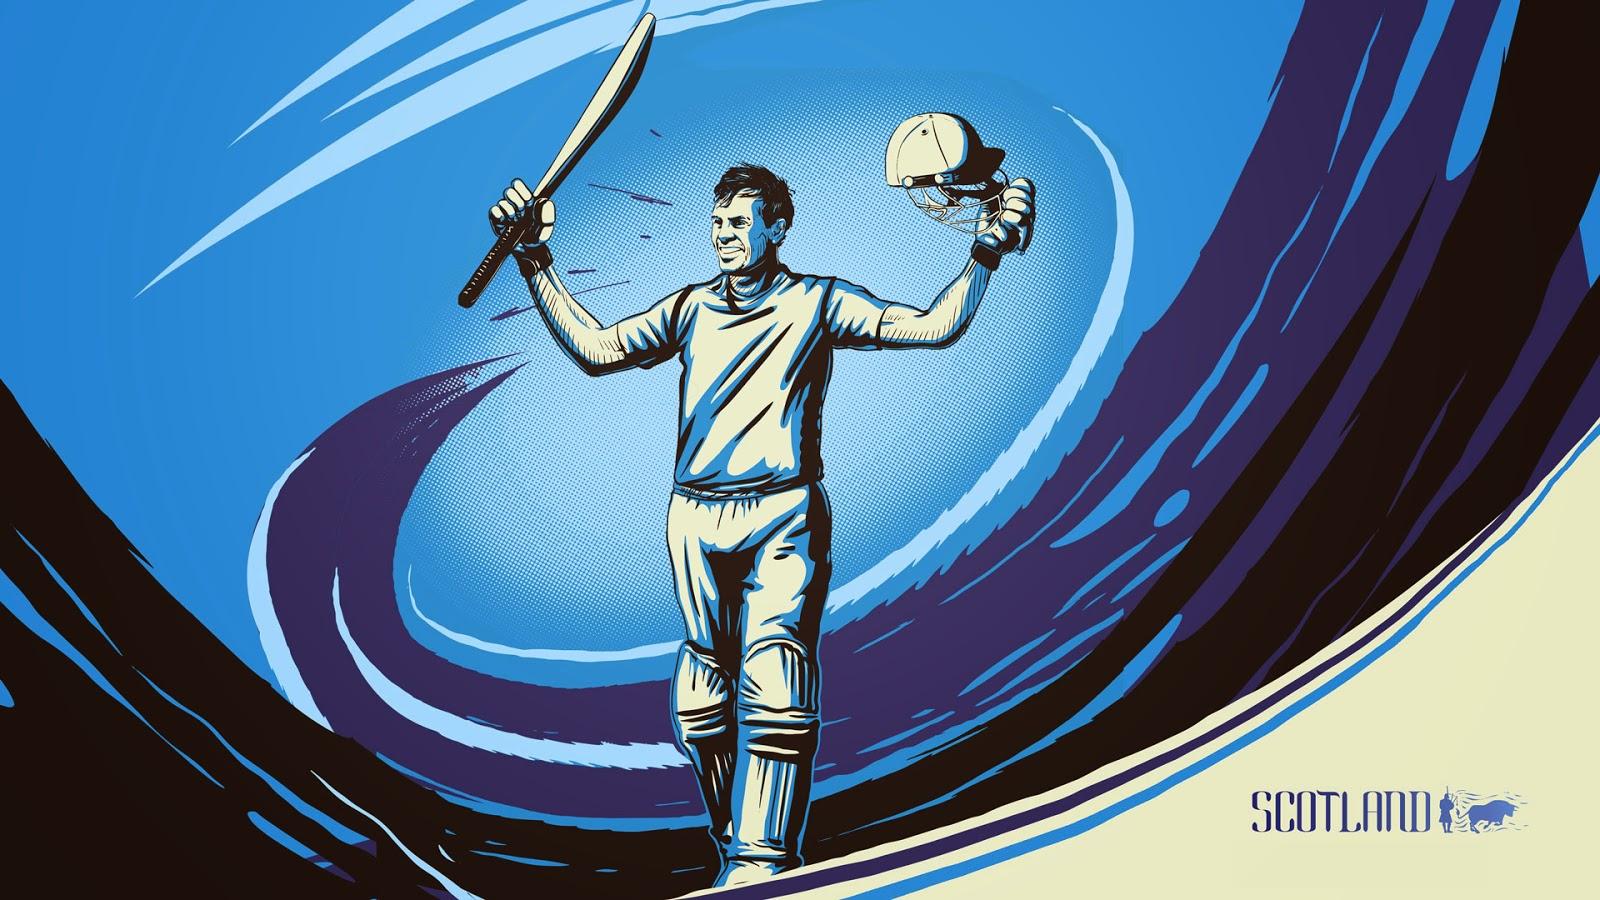 Preston Mommsen Scottish cricketer illustration sketch